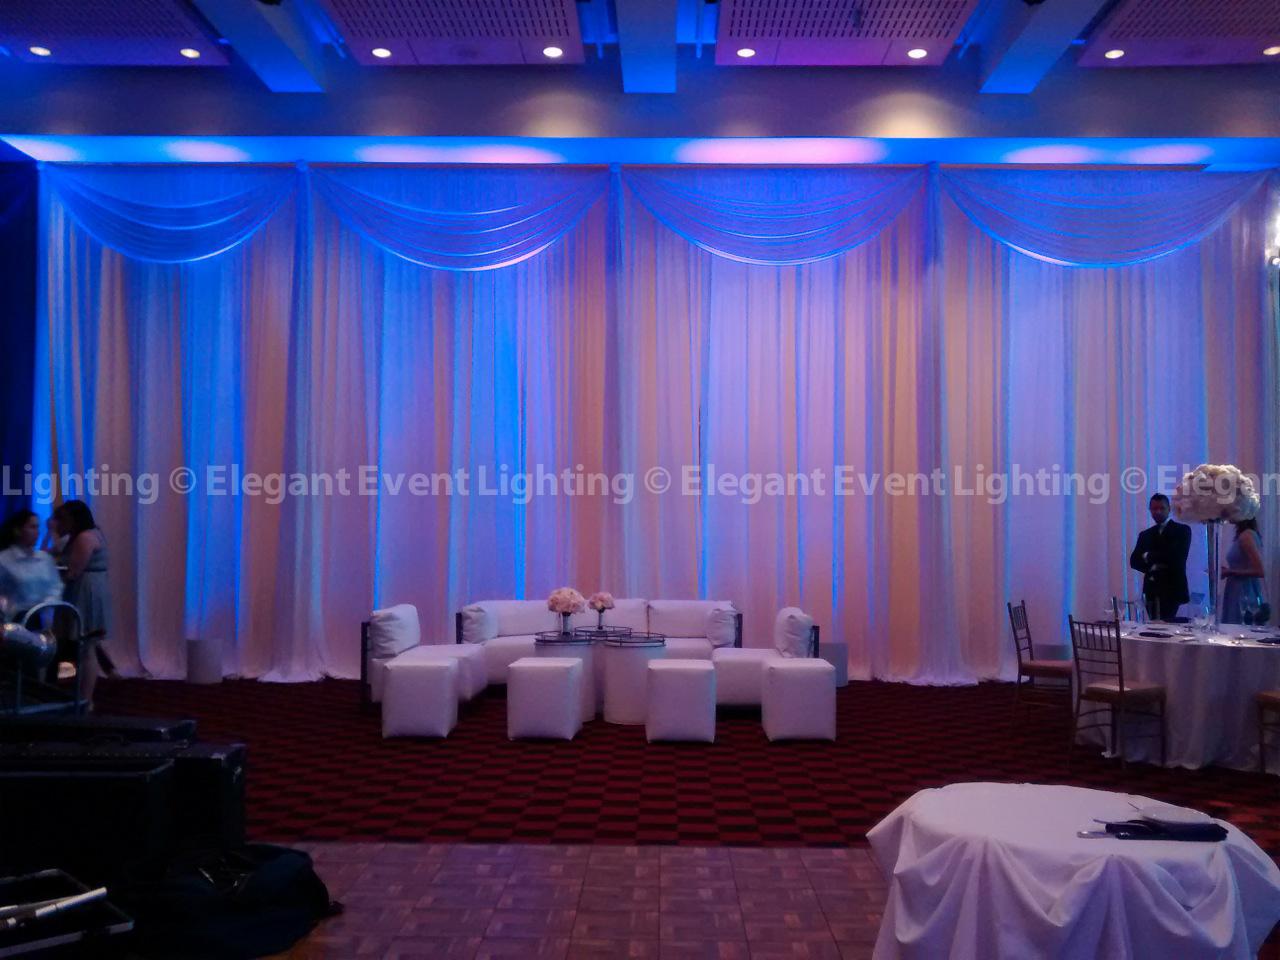 Elegant Event Lighting Weekend In Review June 28 29 2014